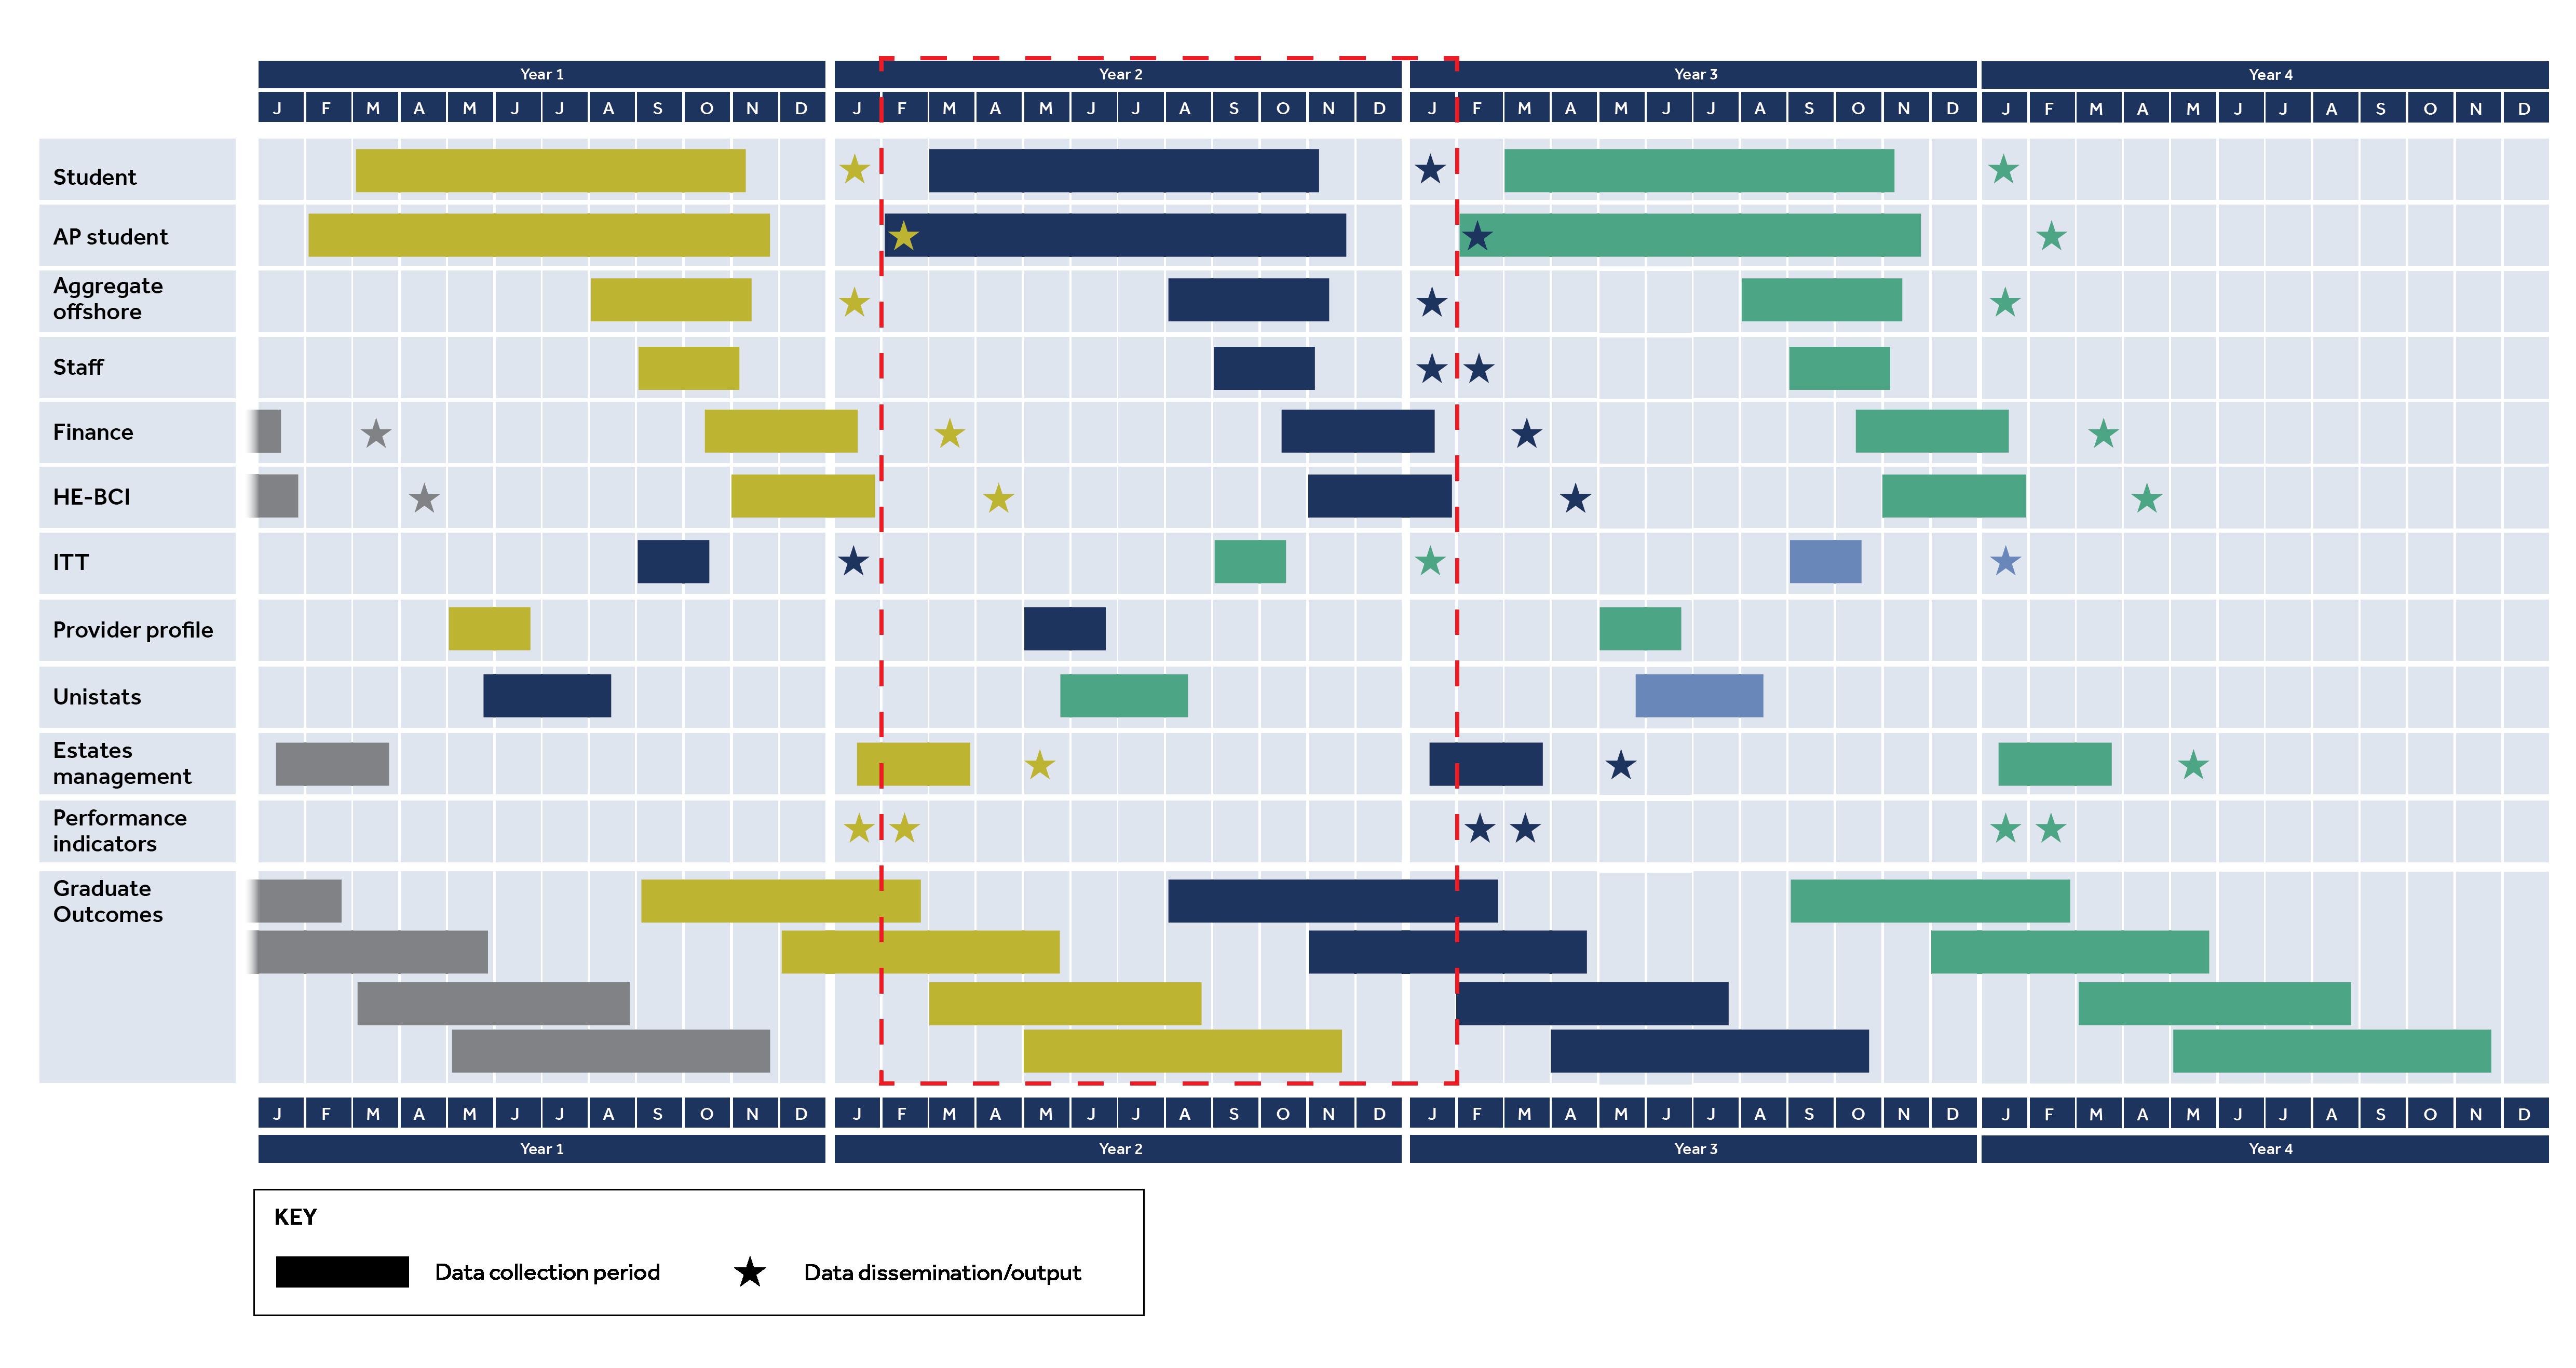 Master data calendar one year